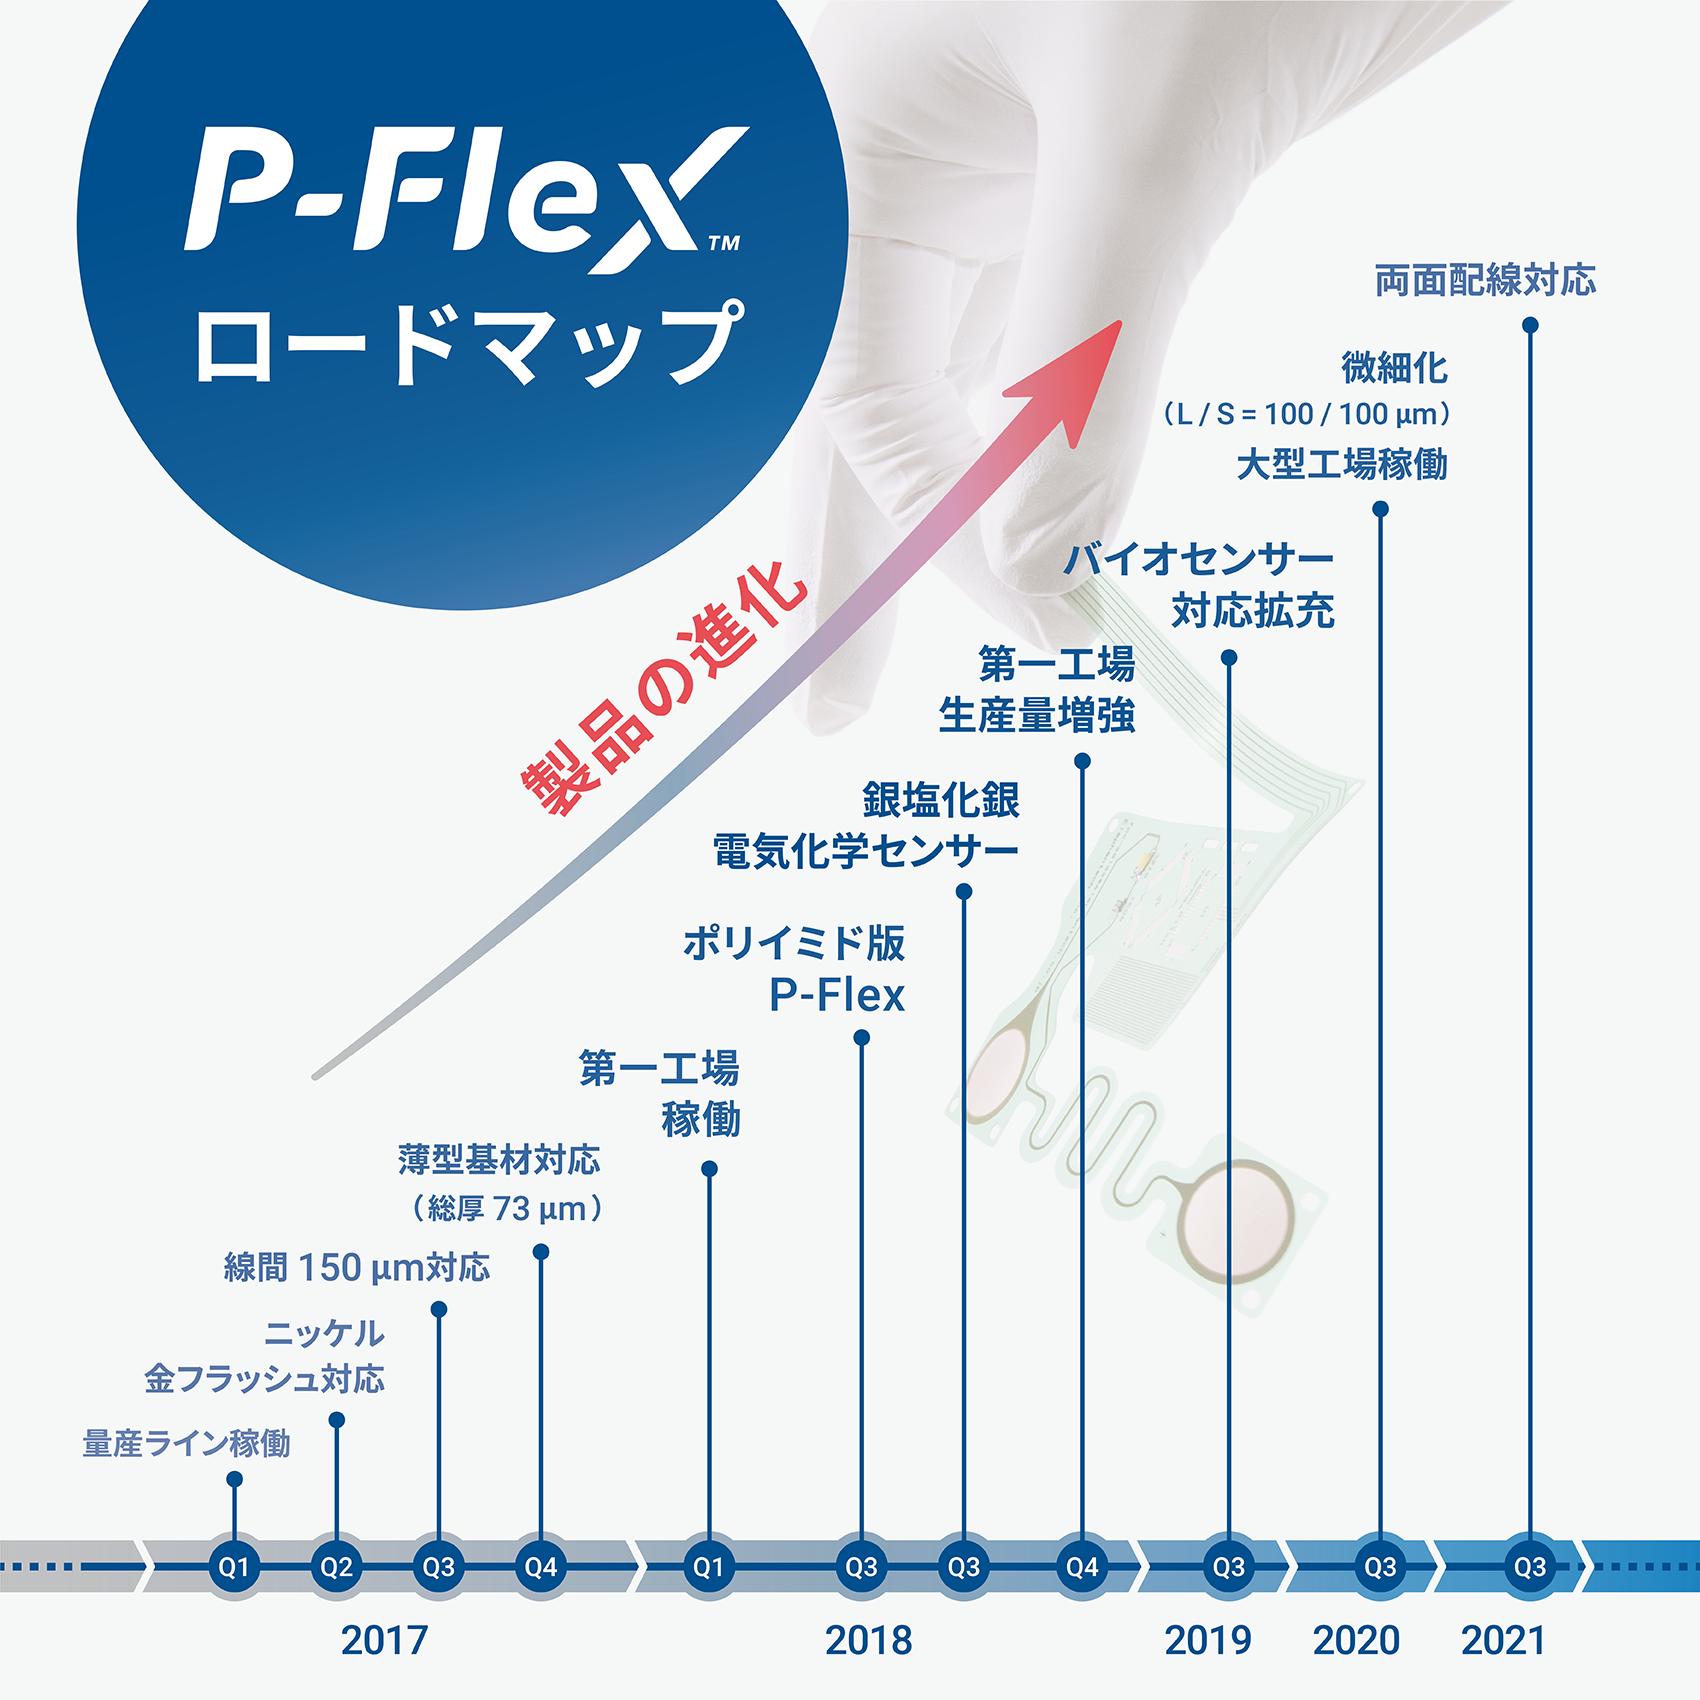 P-Flex™ ロードマップ